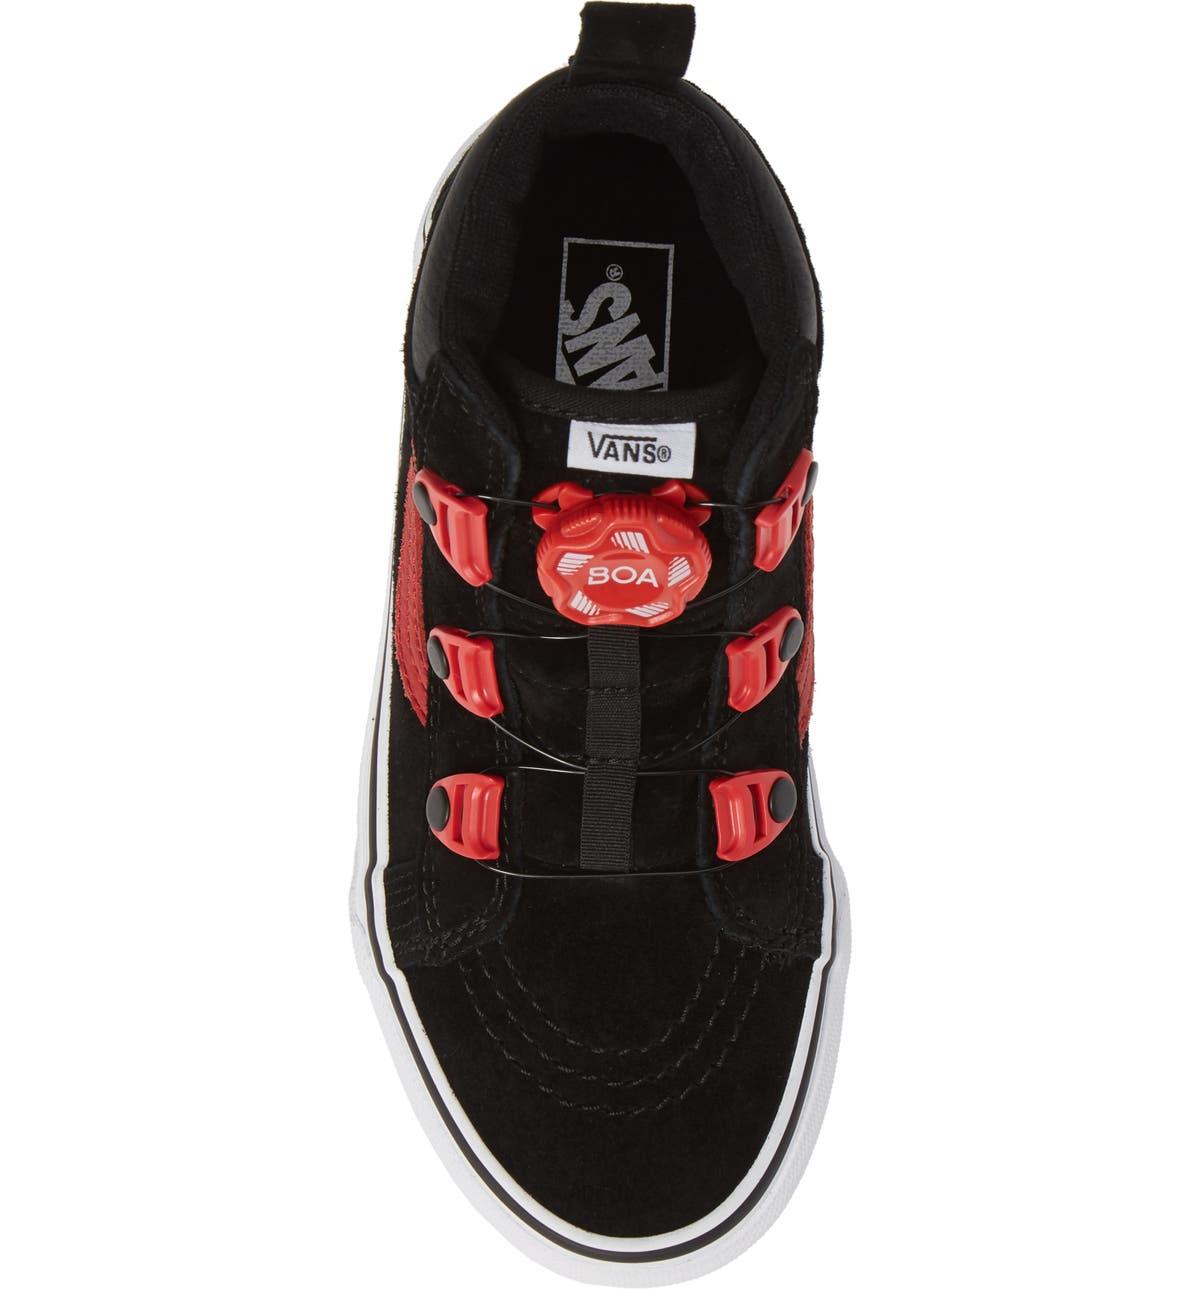 3b6bbf26fd0499 Vans Sk8-Hi MTE Boa Sneaker (Toddler